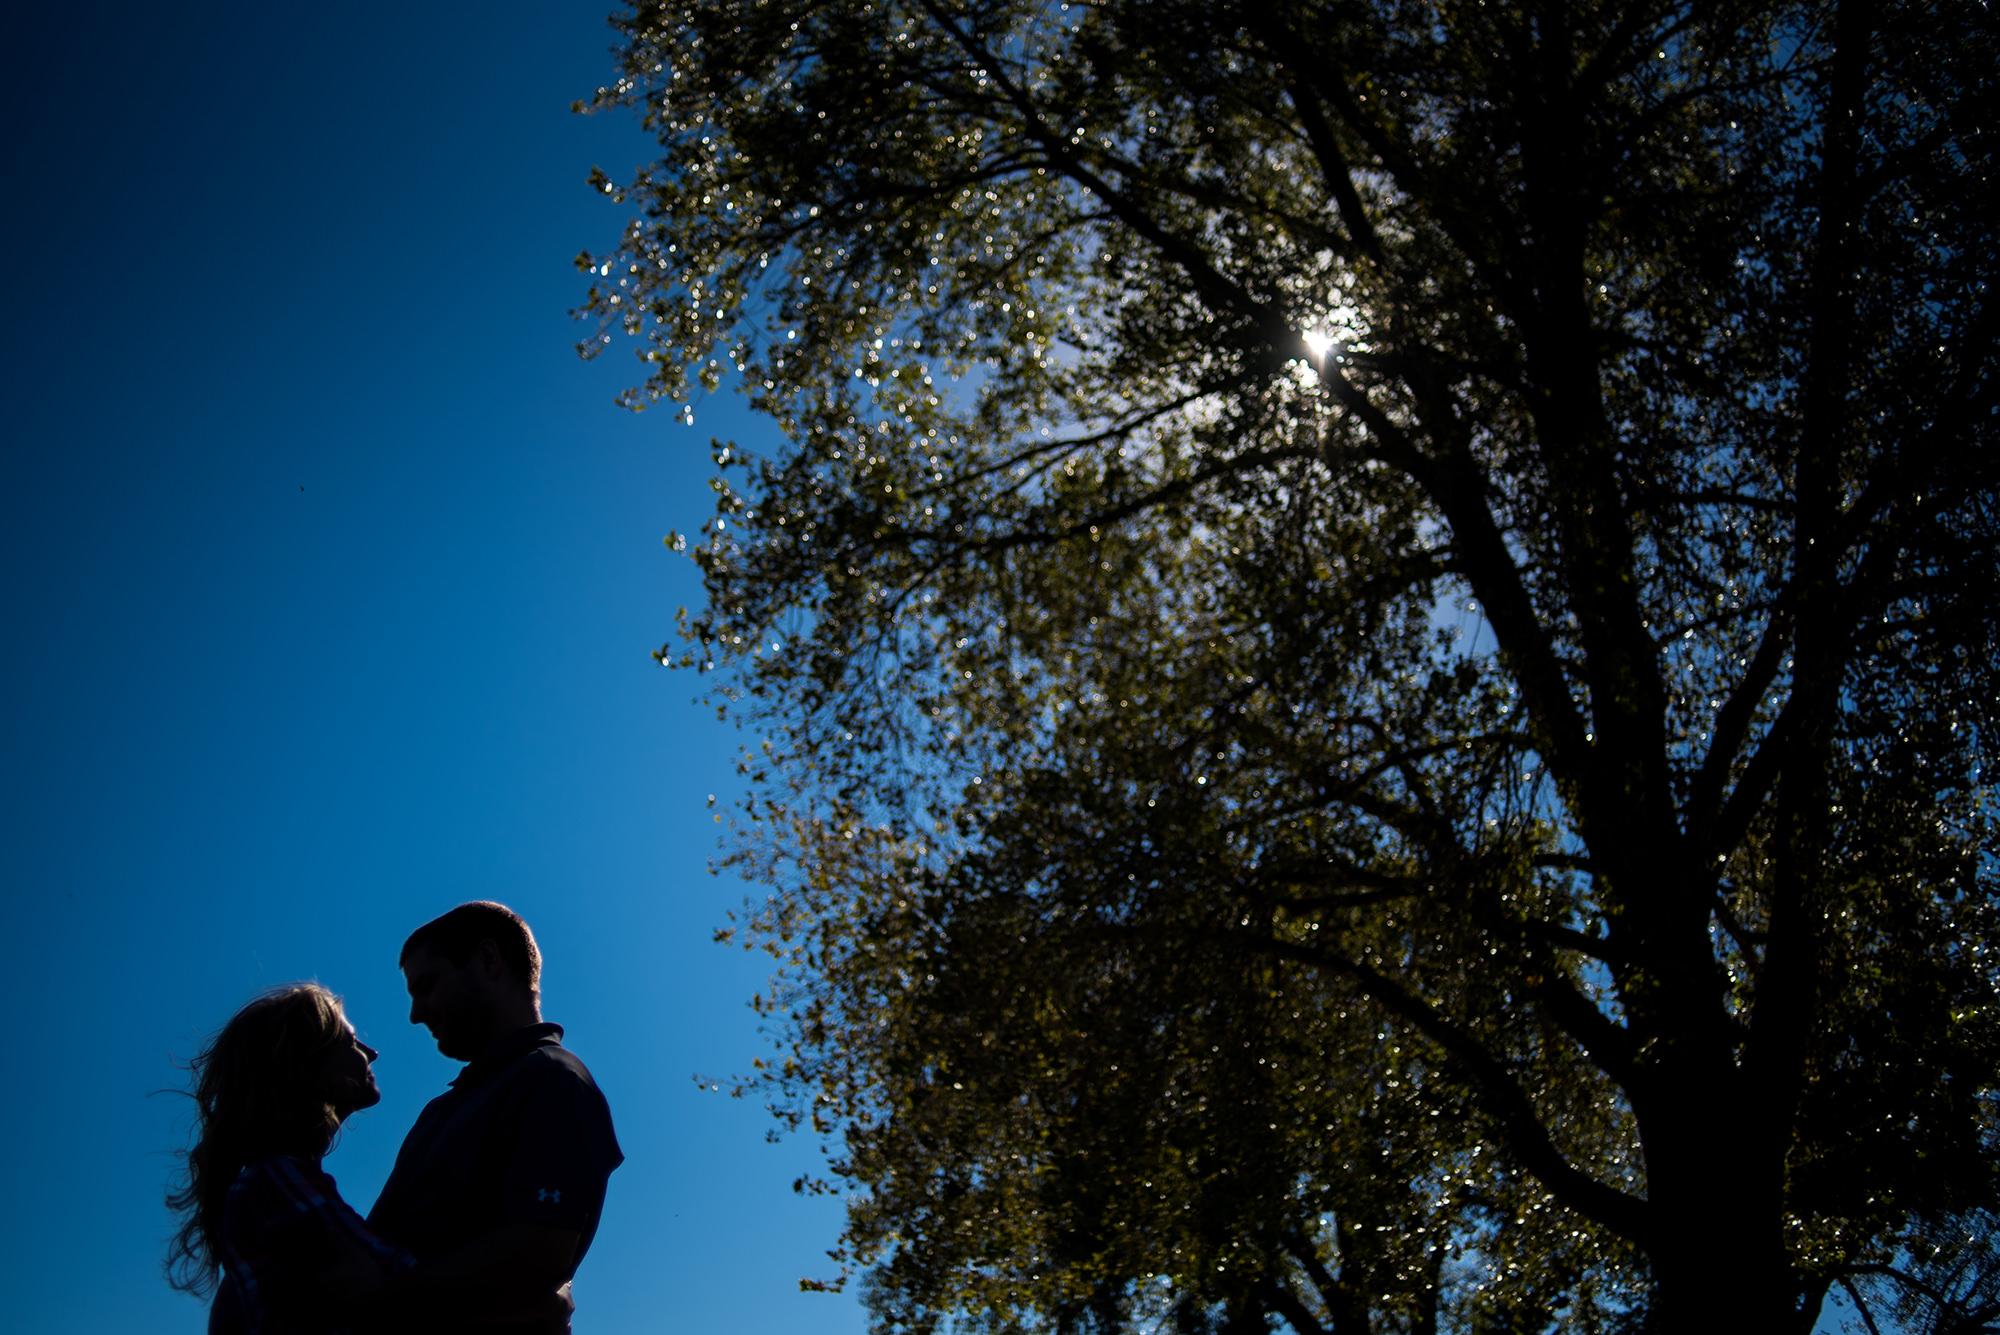 twin-rivers-omaha-campground-engagement-photos-in-nebraska.jpg